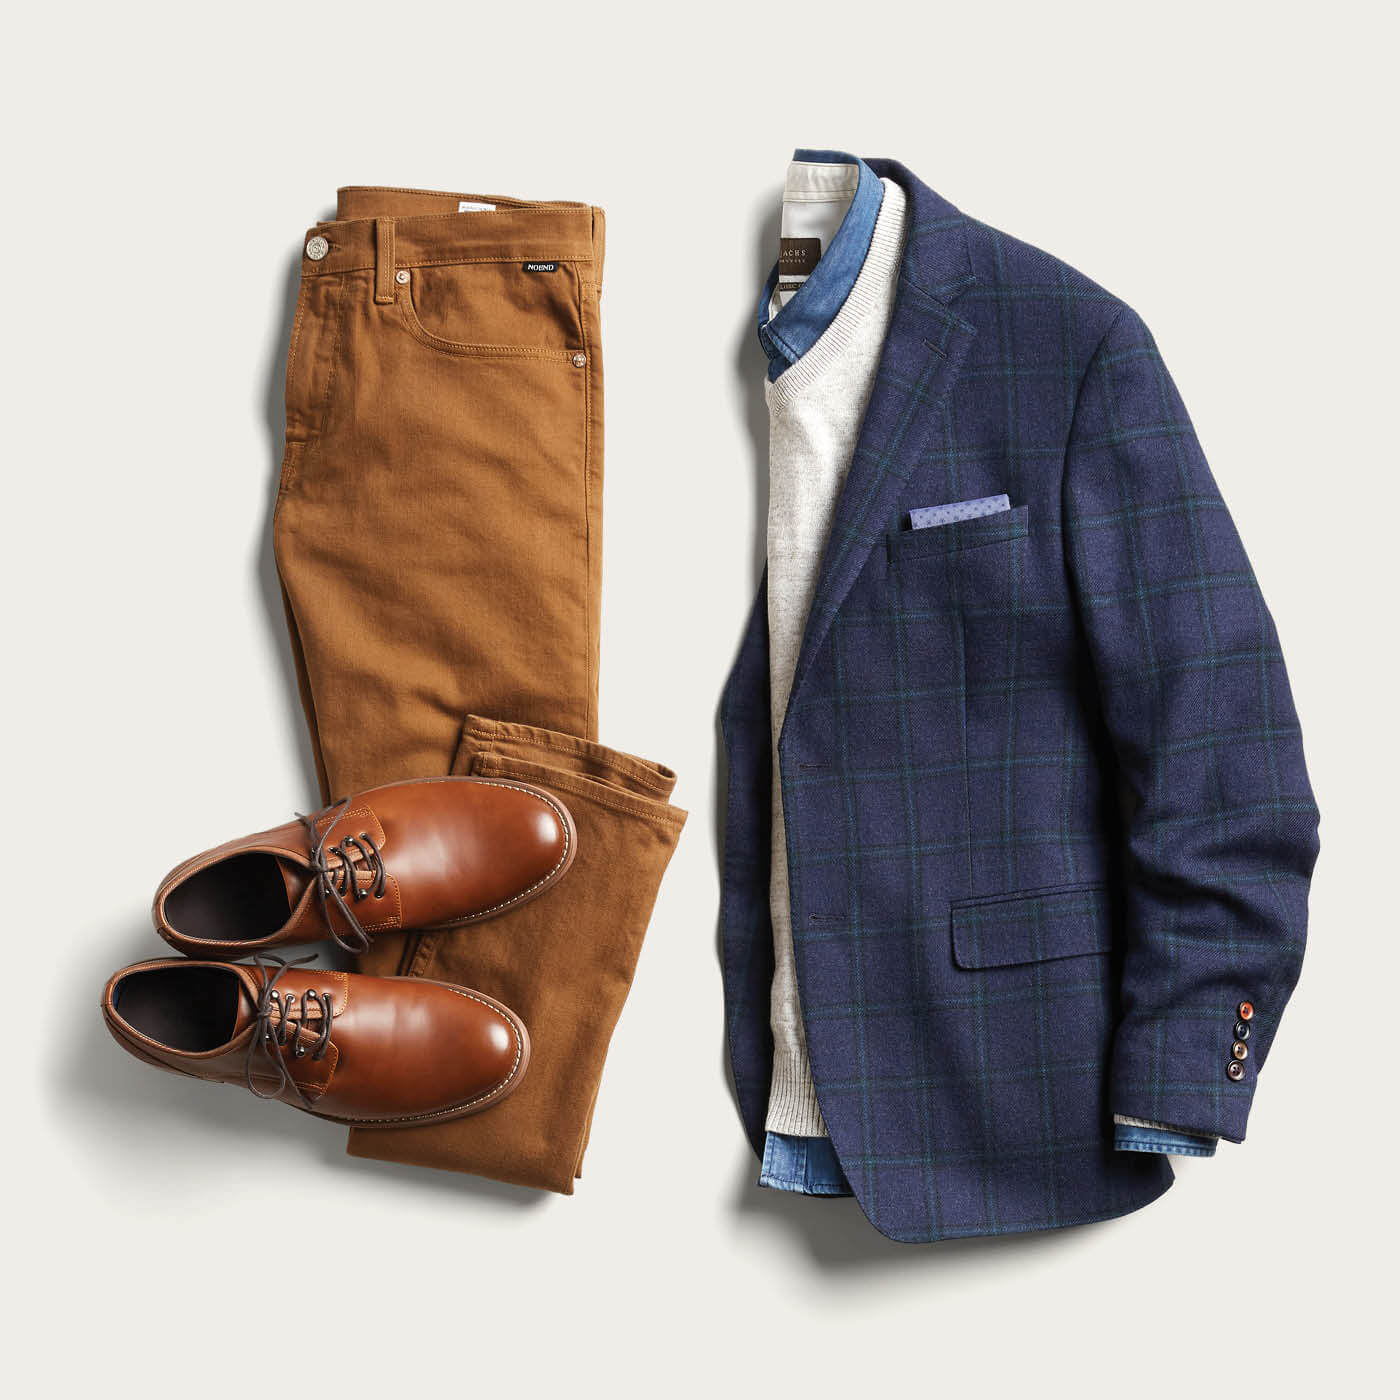 navy blazer and brown pants